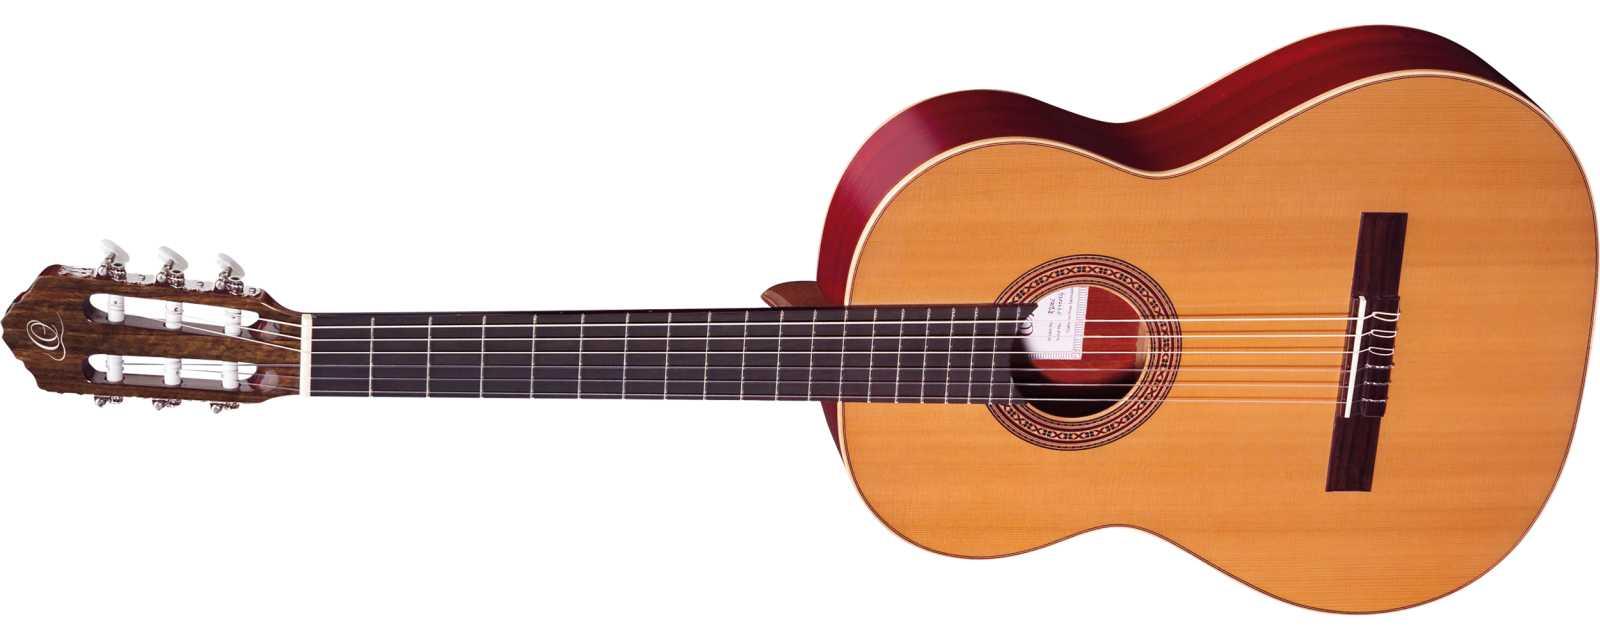 Ortega R-200L Konzertgitarre lefthand